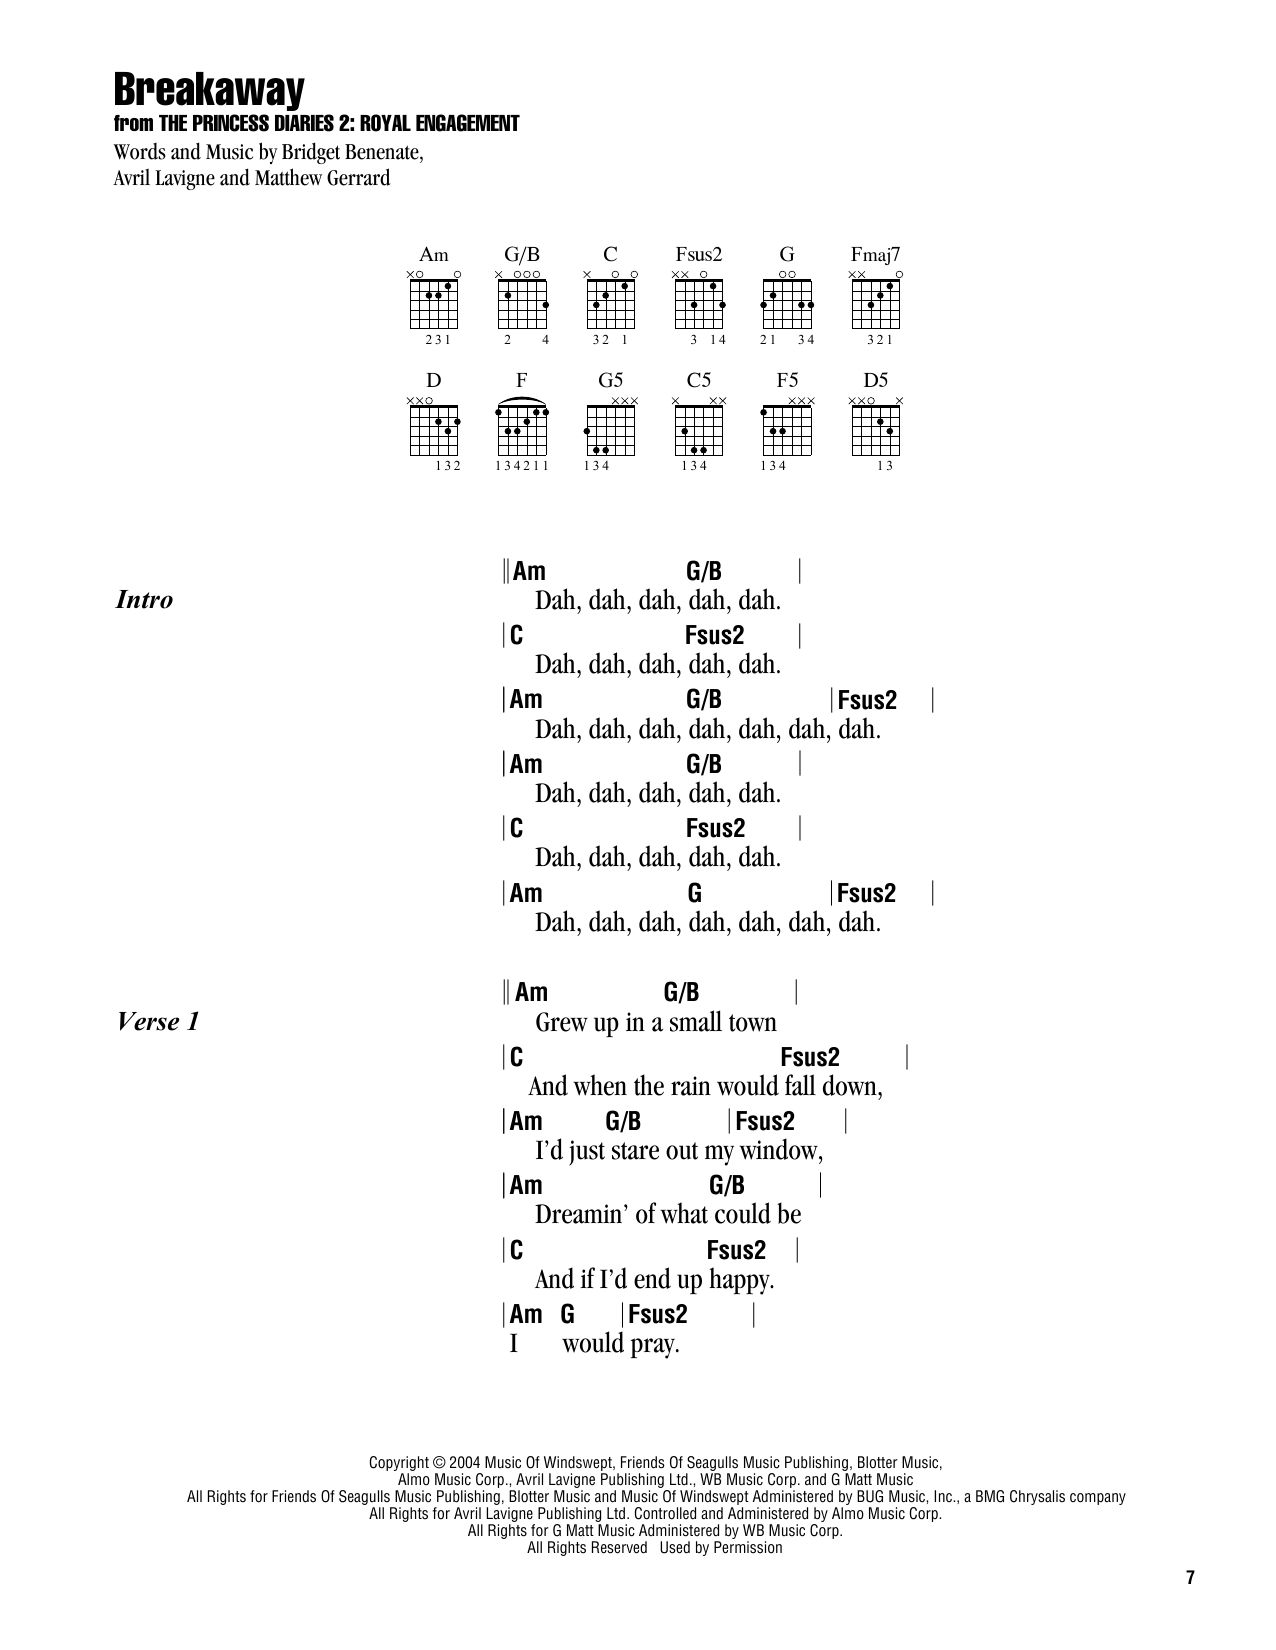 Kelly Clarkson - Breakaway (Chords) - Ultimate-Guitar.Com